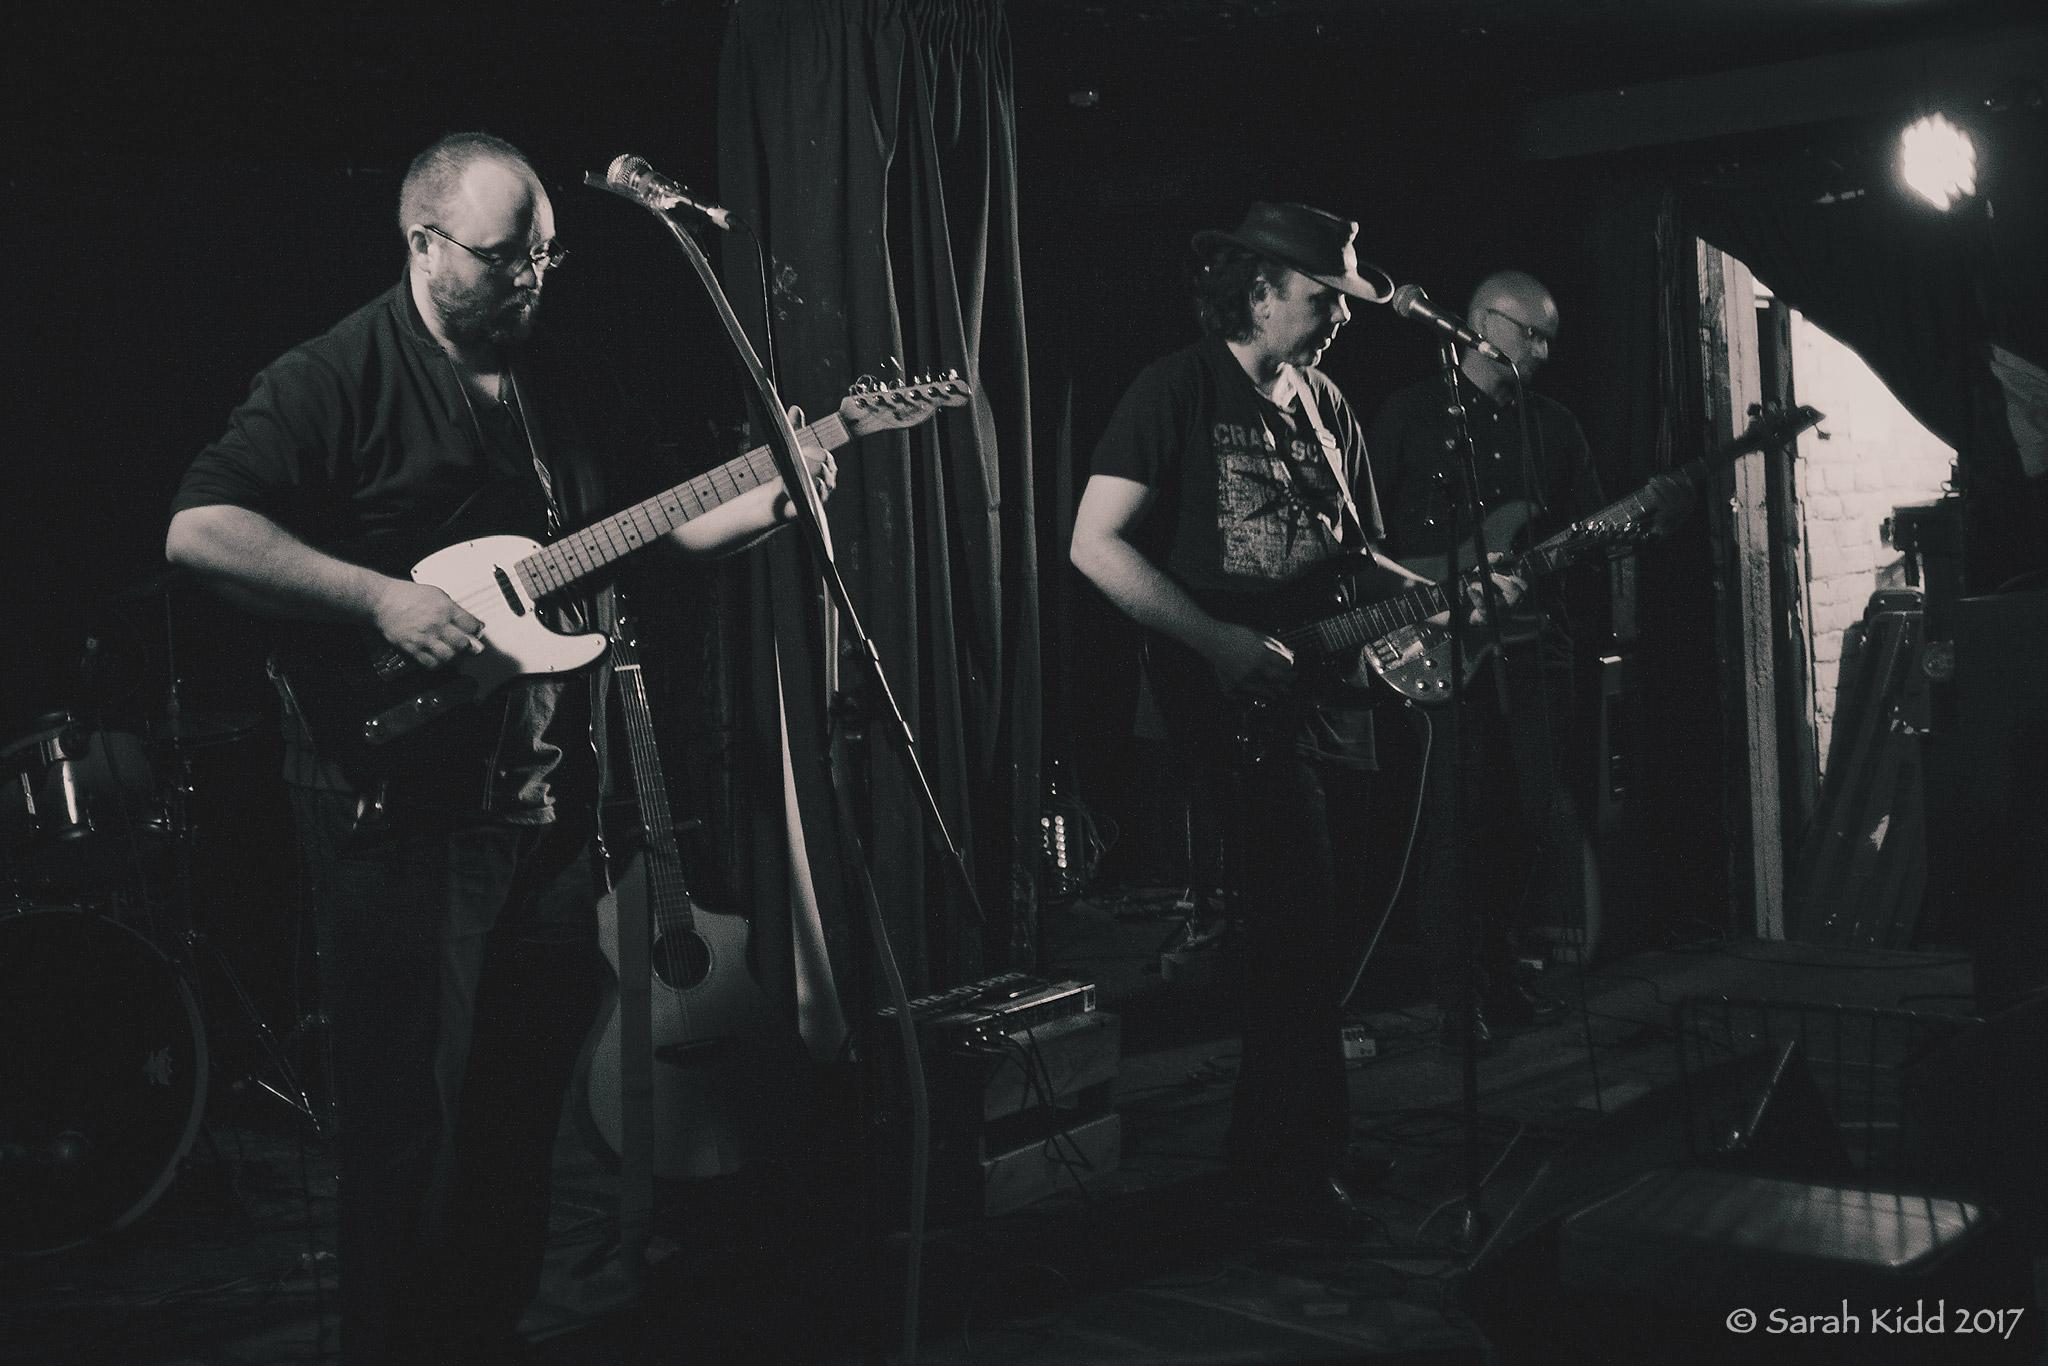 Disjecta Membra,  Whammy Bar , Auckland, 5 February 2017 (L-R): Kane Davey, Michel Rowland, Jaz Murphy. Photo: Sarah Kidd,  Ambient Light